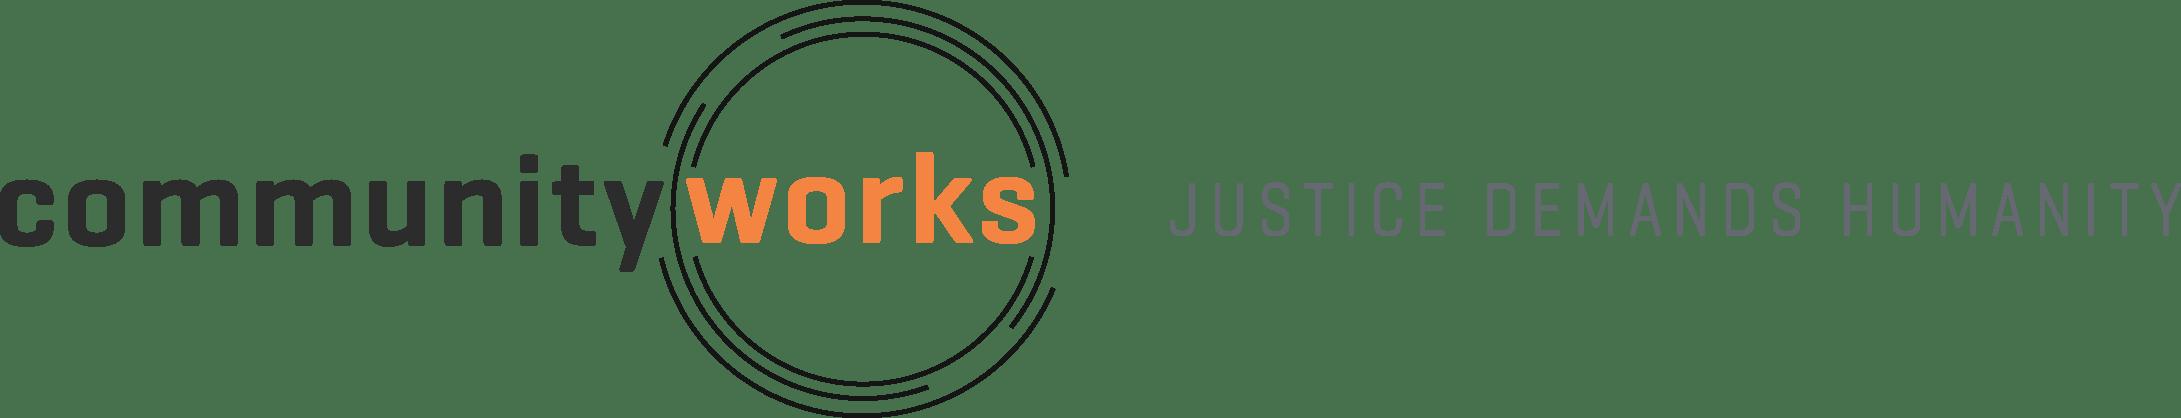 Community Works - Tay Men Reentry & Women Rising